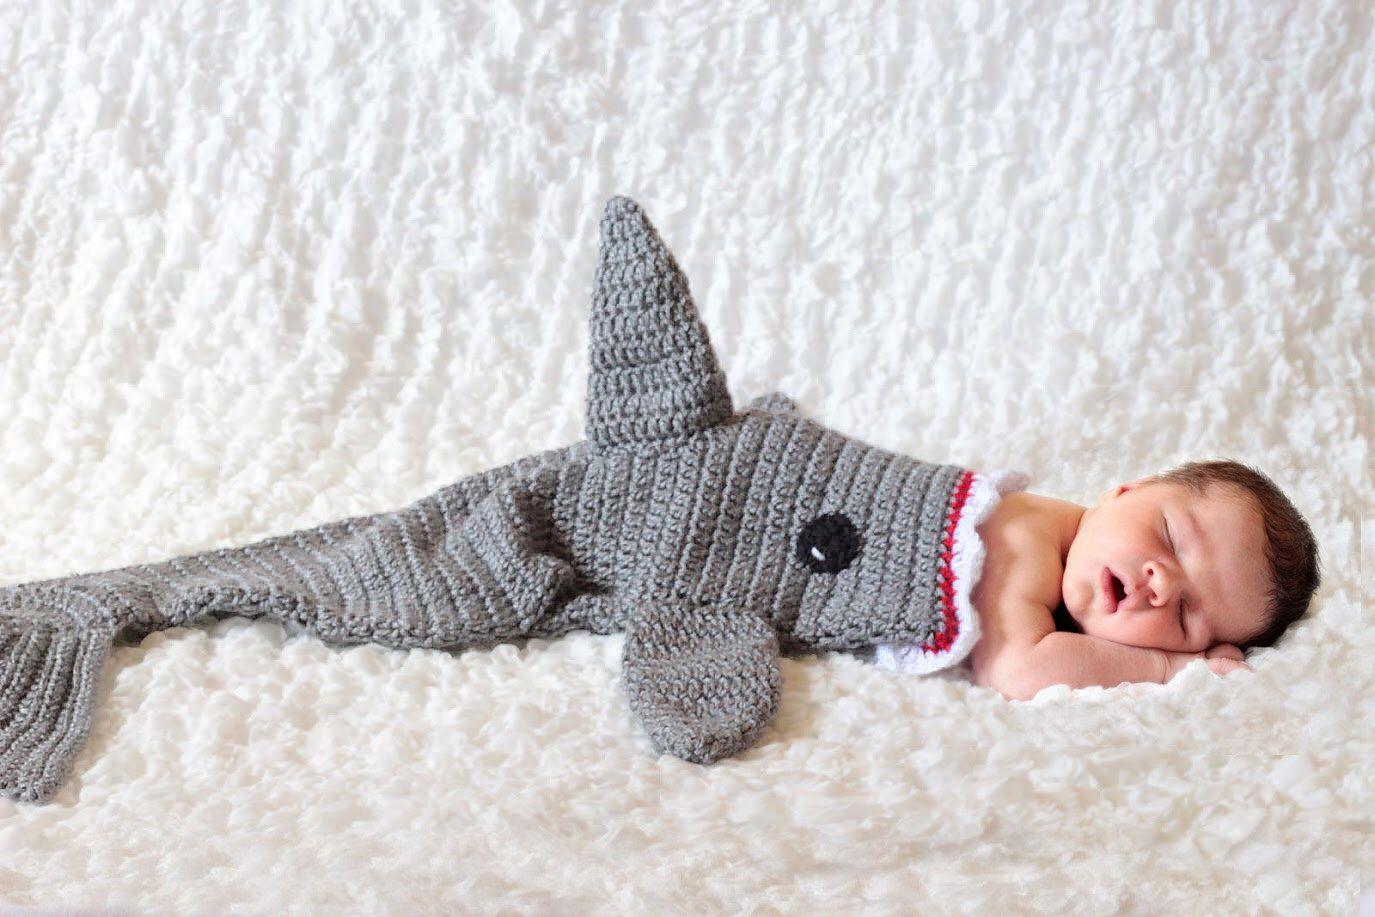 Shark Blanket Cocoon, Crochet Shark Blanket, Shark Baby Cocoon ...